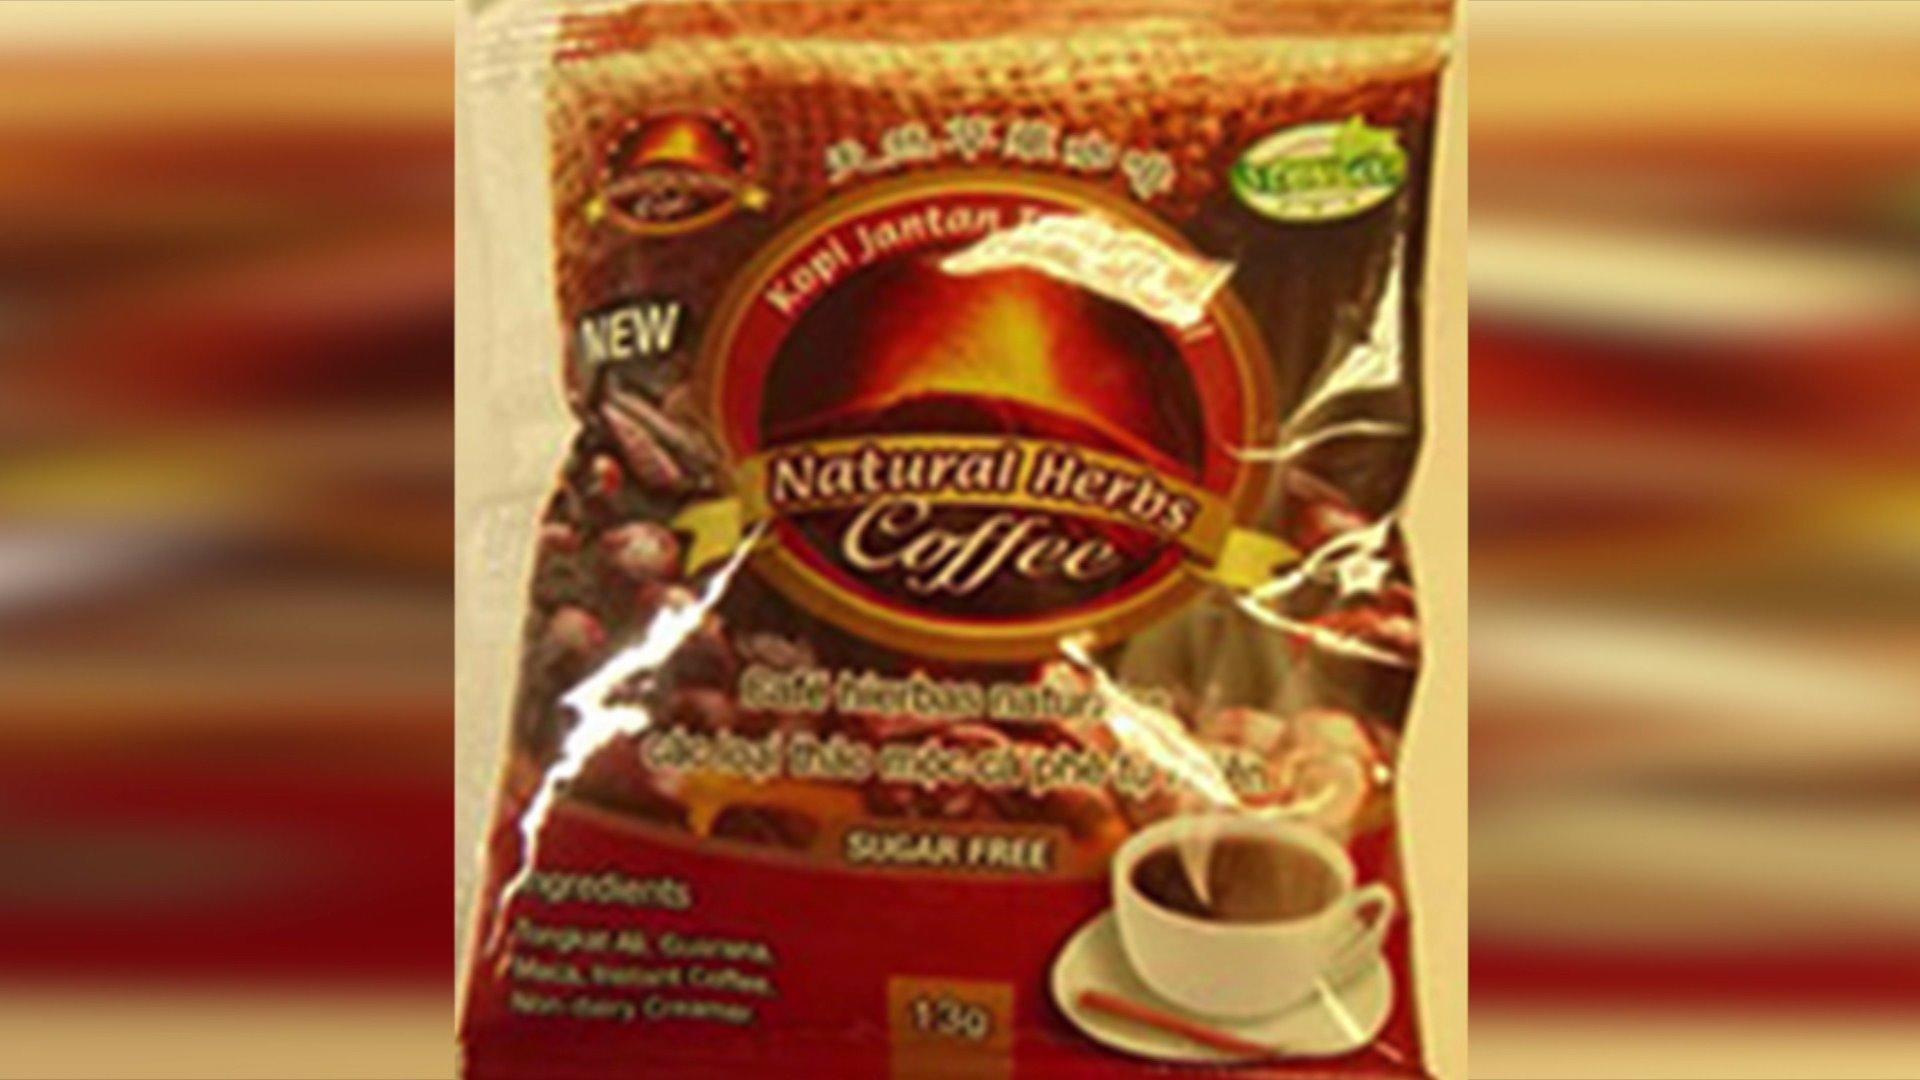 Coffee Recalled Over Undeclared Viagra-Like Ingredient